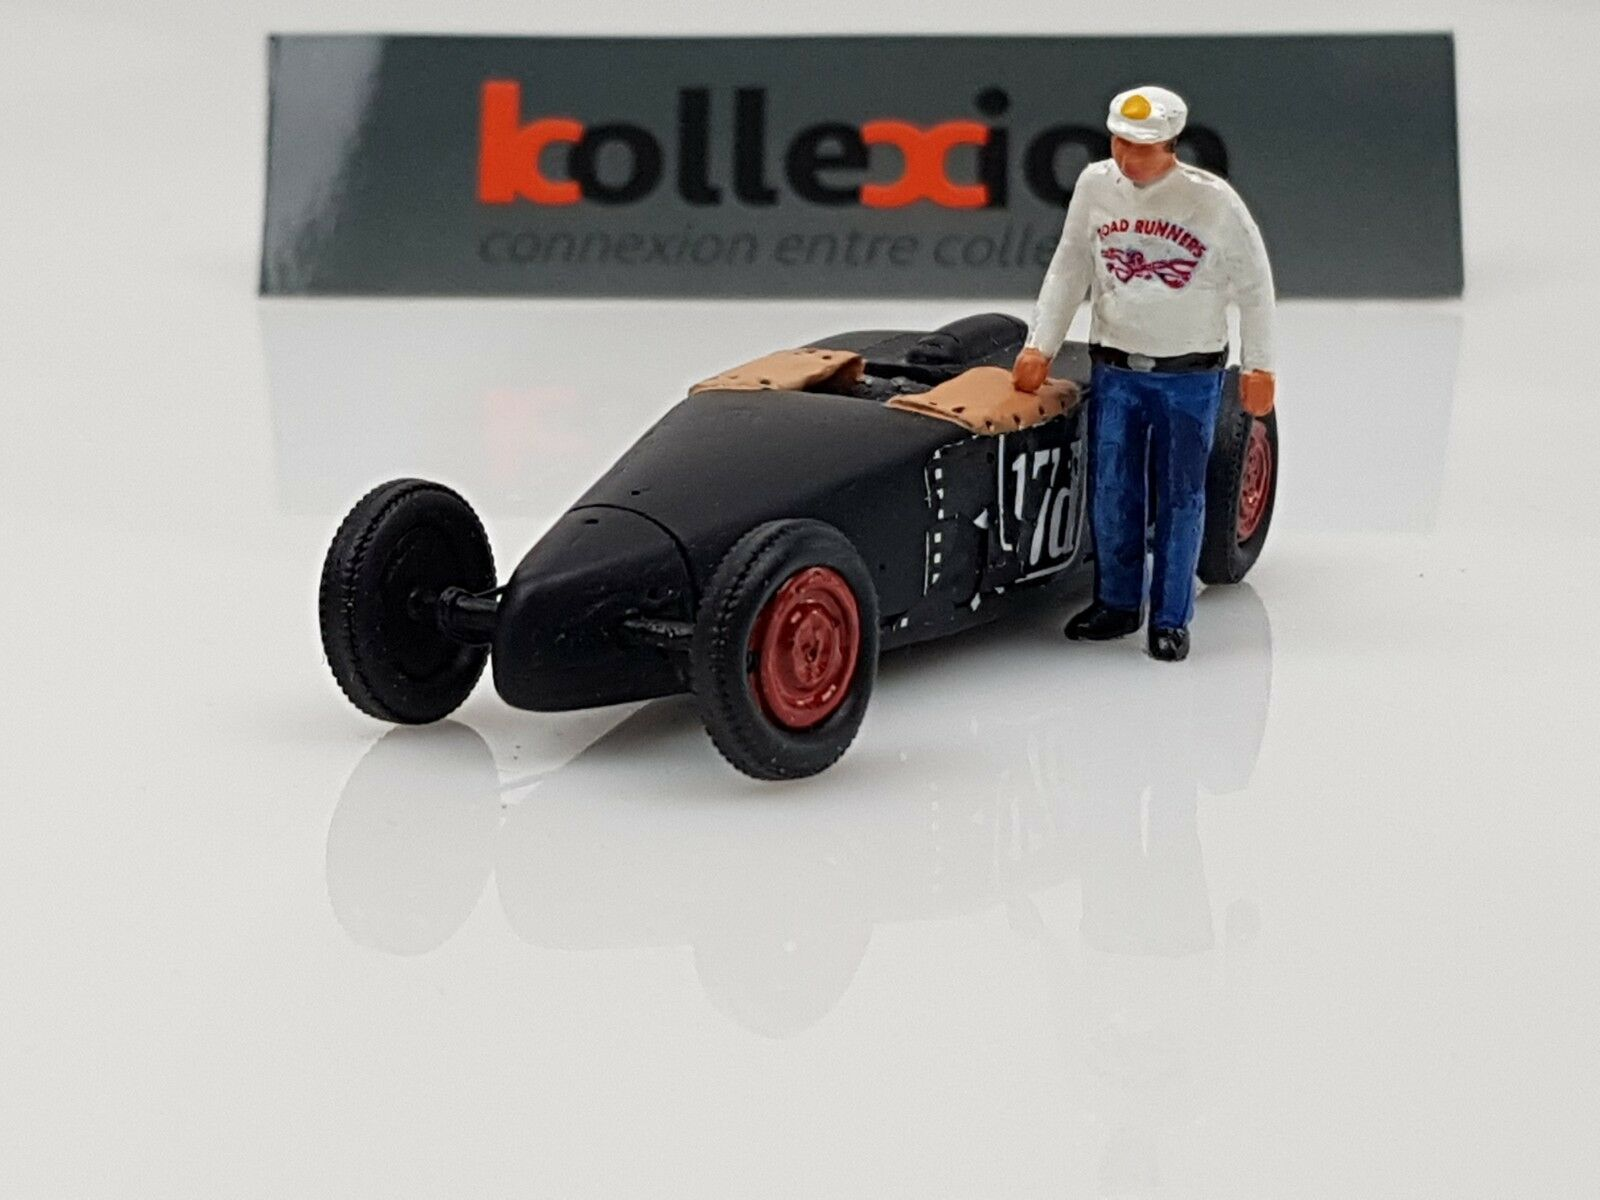 Soldan models Frot Carrillo Roadster RECORD BONNEVILLE 1951 + Character 1.43